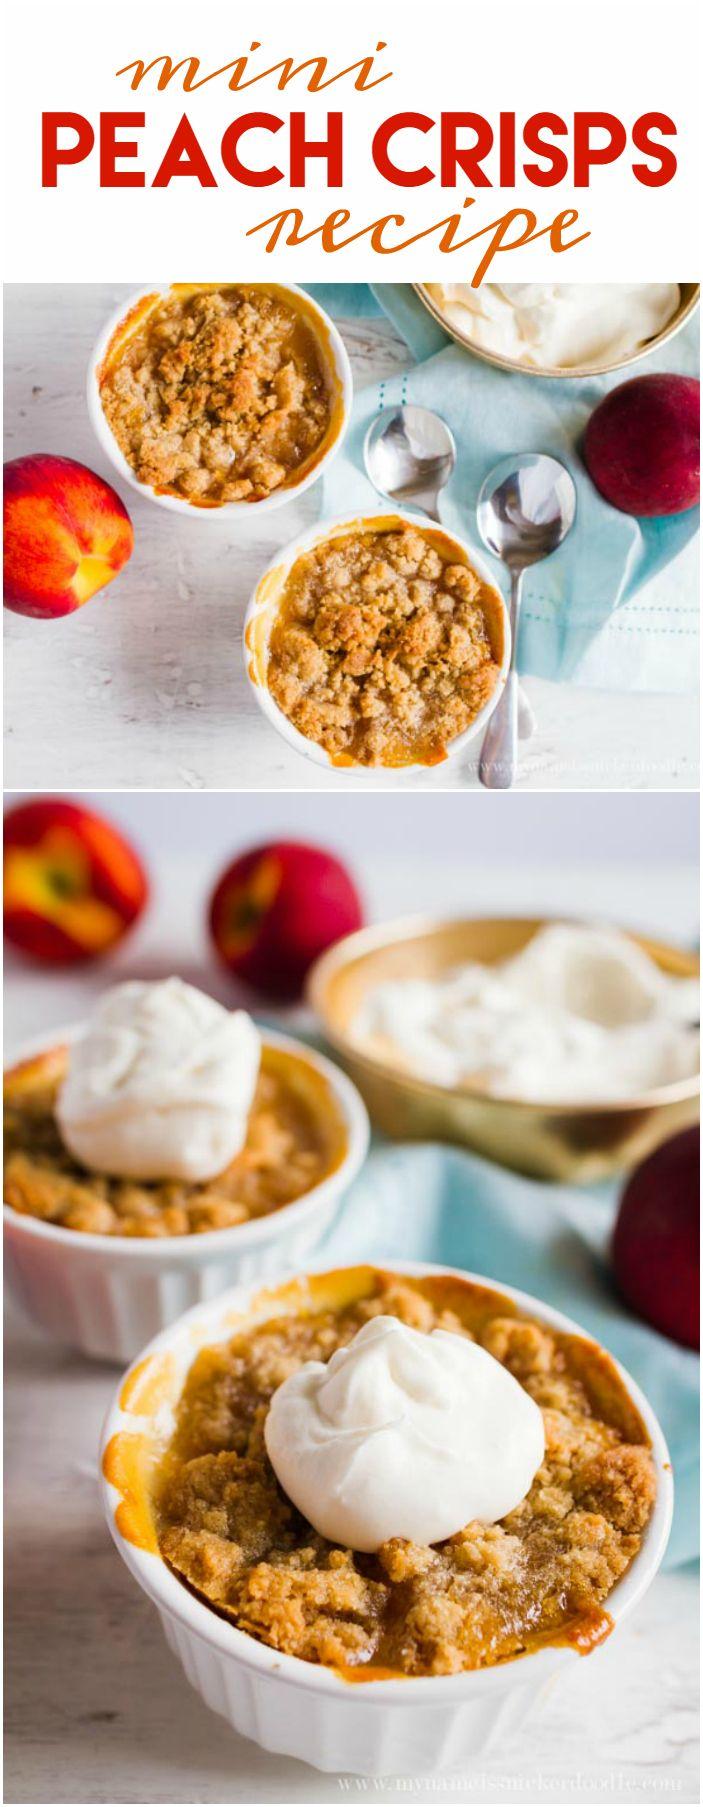 Mini Peach Crisps recipe. SO GOOD! You'll love this easy to make dessert, a family favorite!